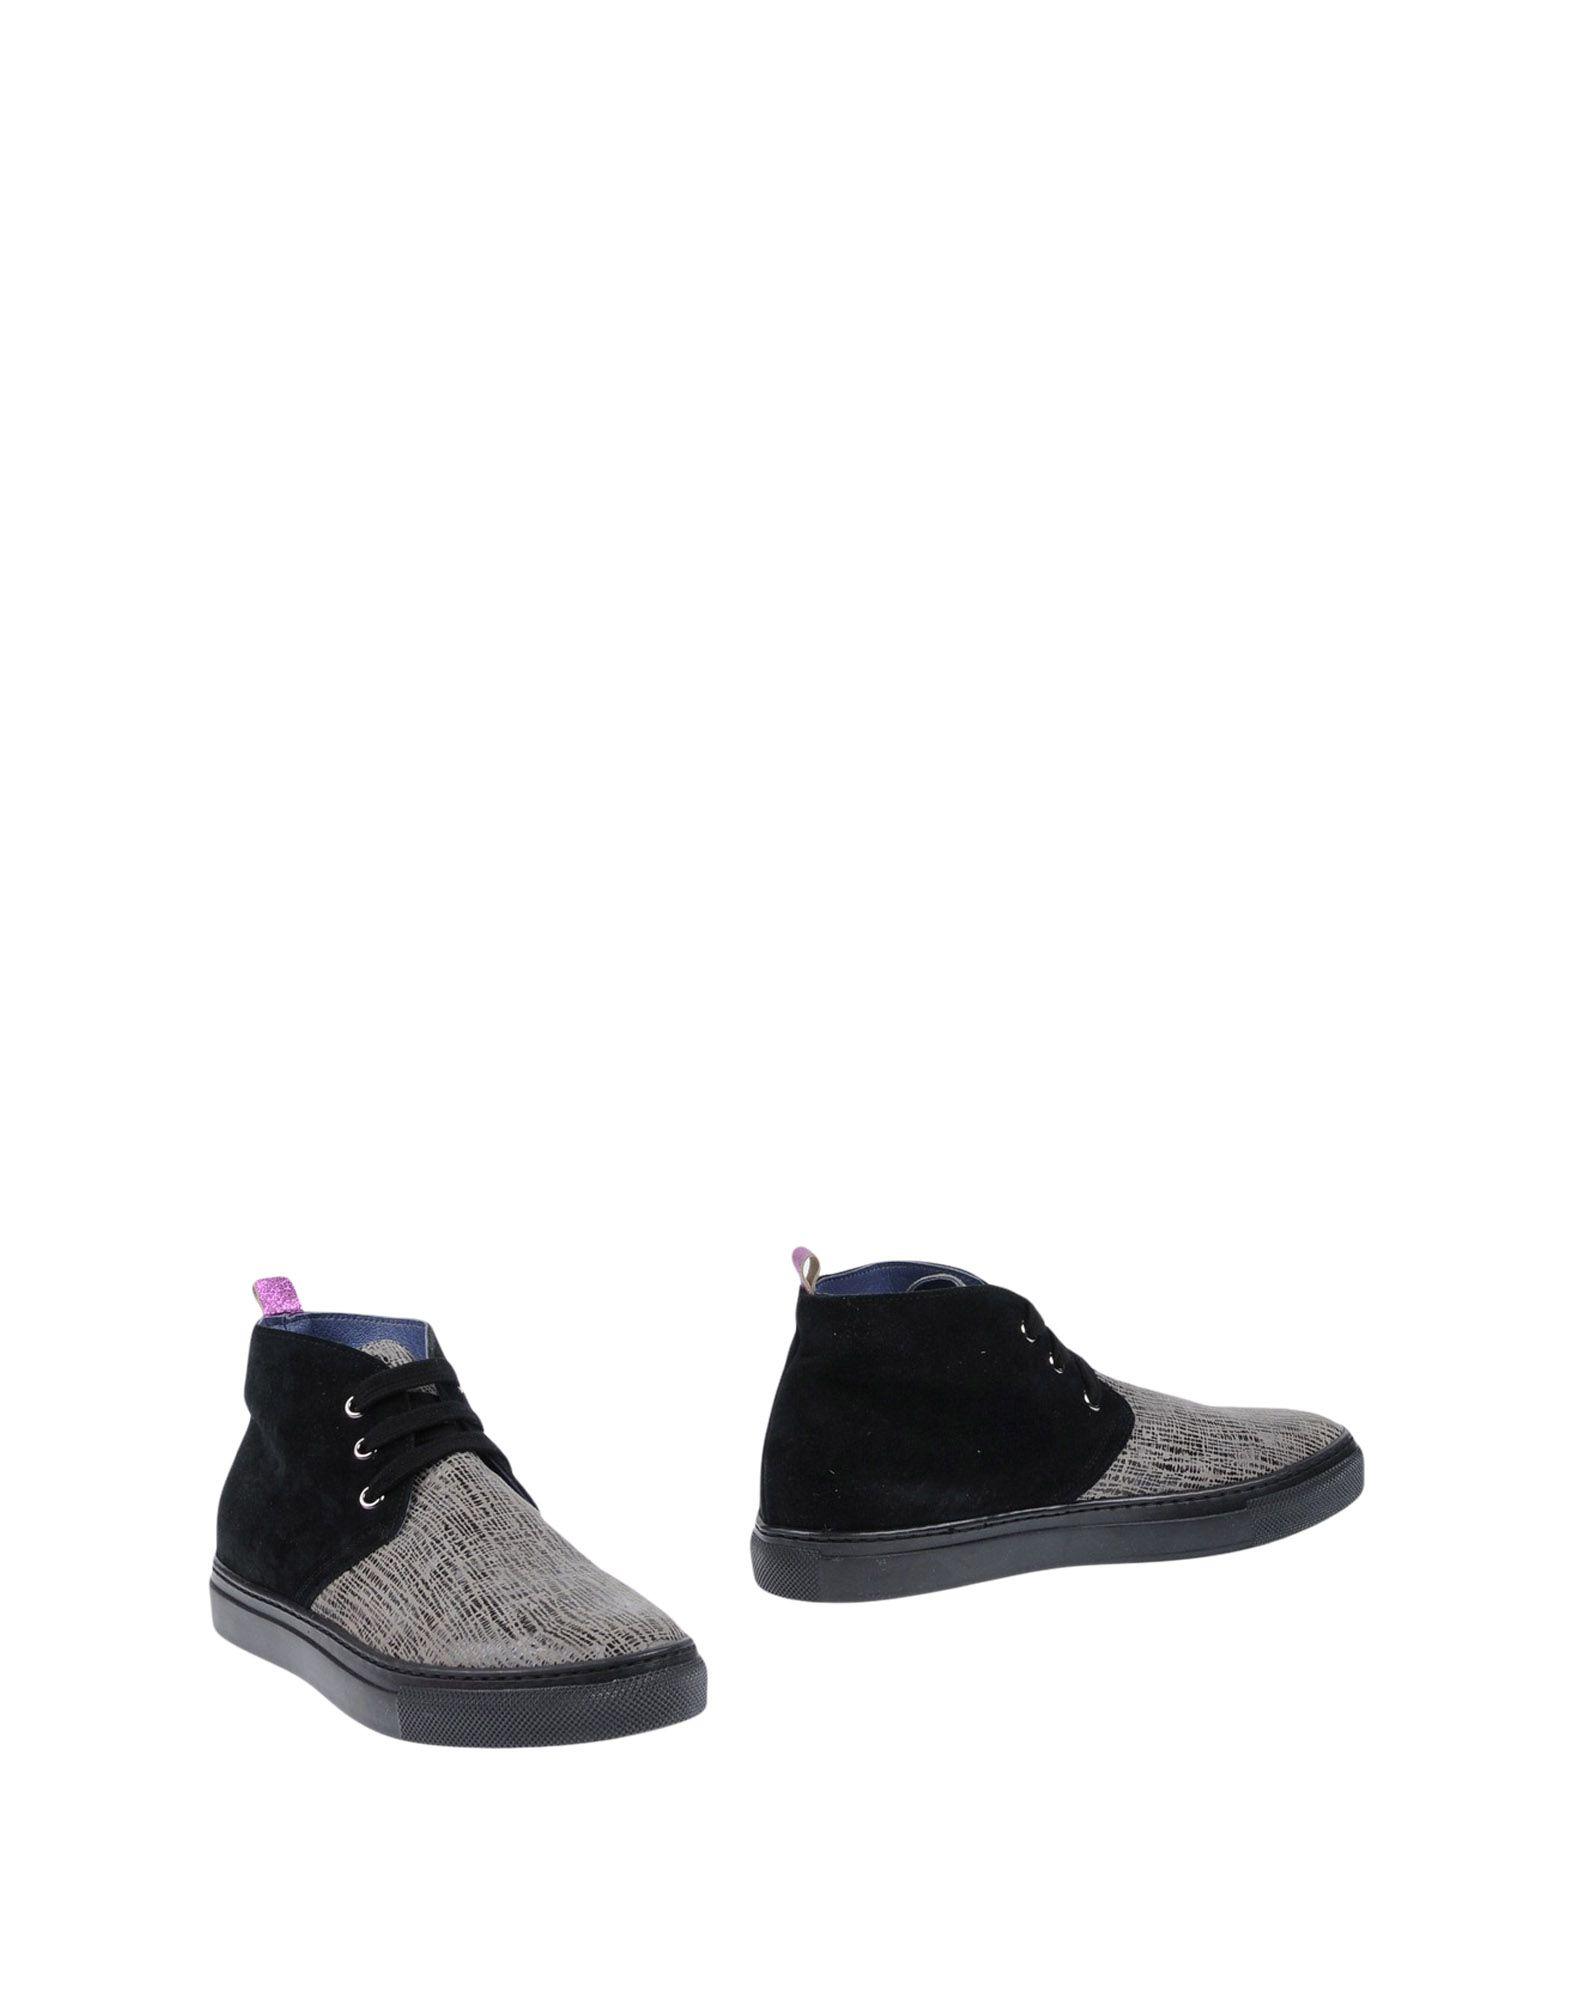 Ebarrito Stiefelette Damen  11457355PB Gute beliebte Qualität beliebte Gute Schuhe 92d772